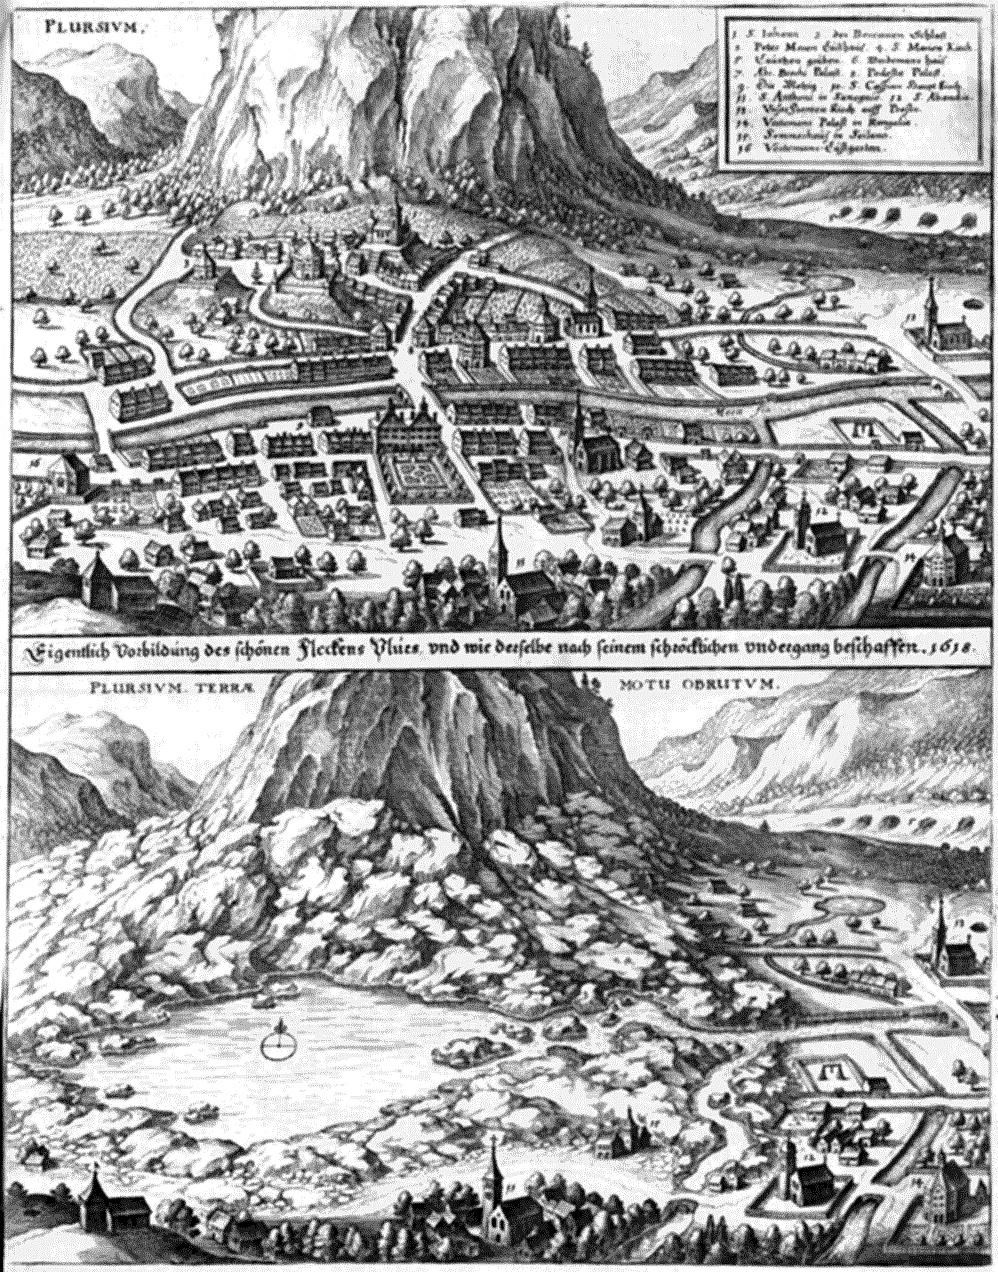 David Bressan. (Sep. 04, 2011). September 4, 1618: The landslide of Plurs. Scientific American.